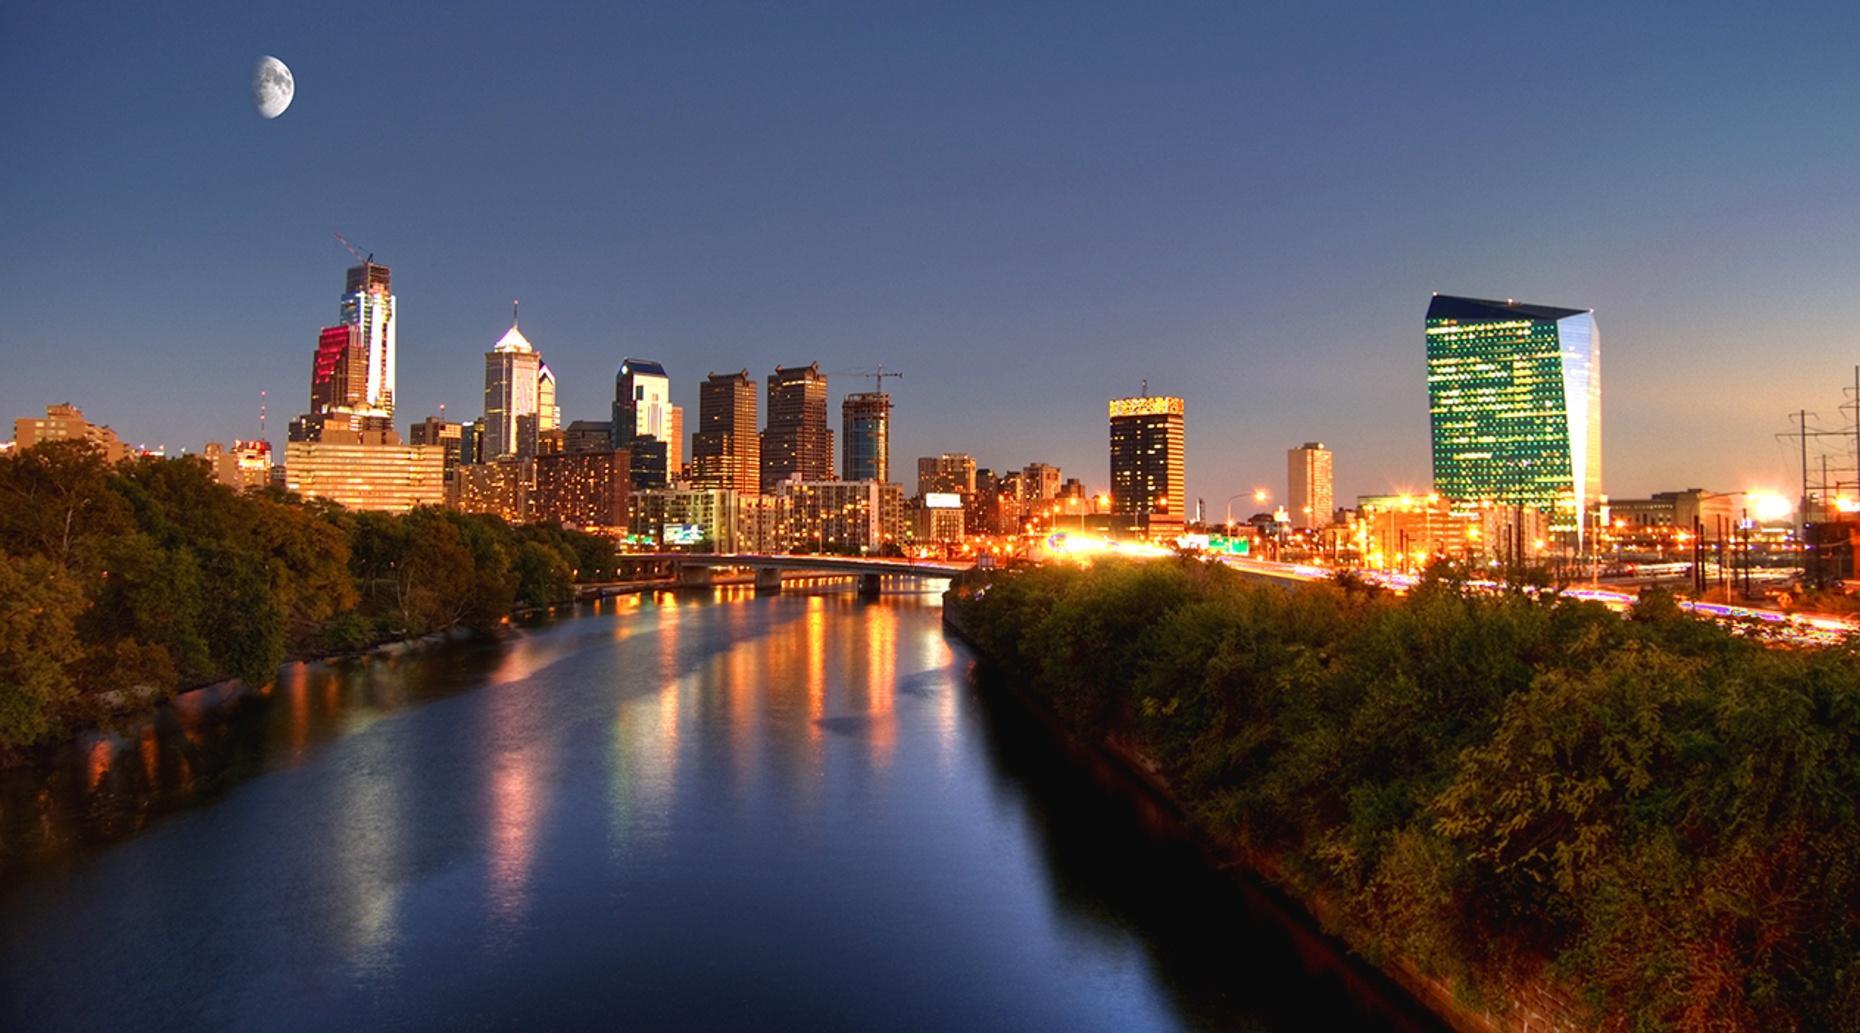 Nighttime Pirate Riverboat Cruise in Philadelphia